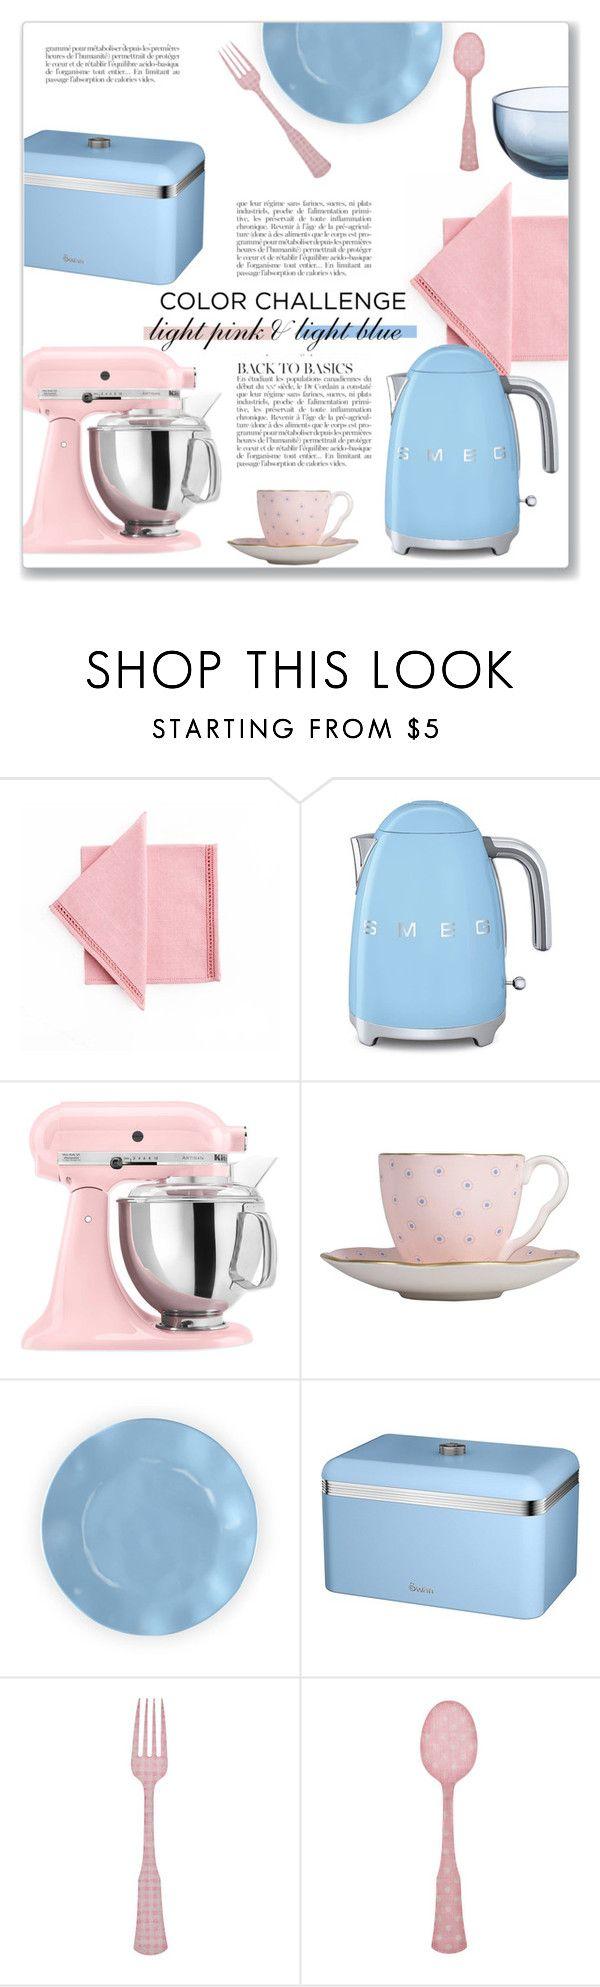 Blue Kitchen Decor Accessories 274 Best Images About Sweet Kitchens On Pinterest Dream Kitchens